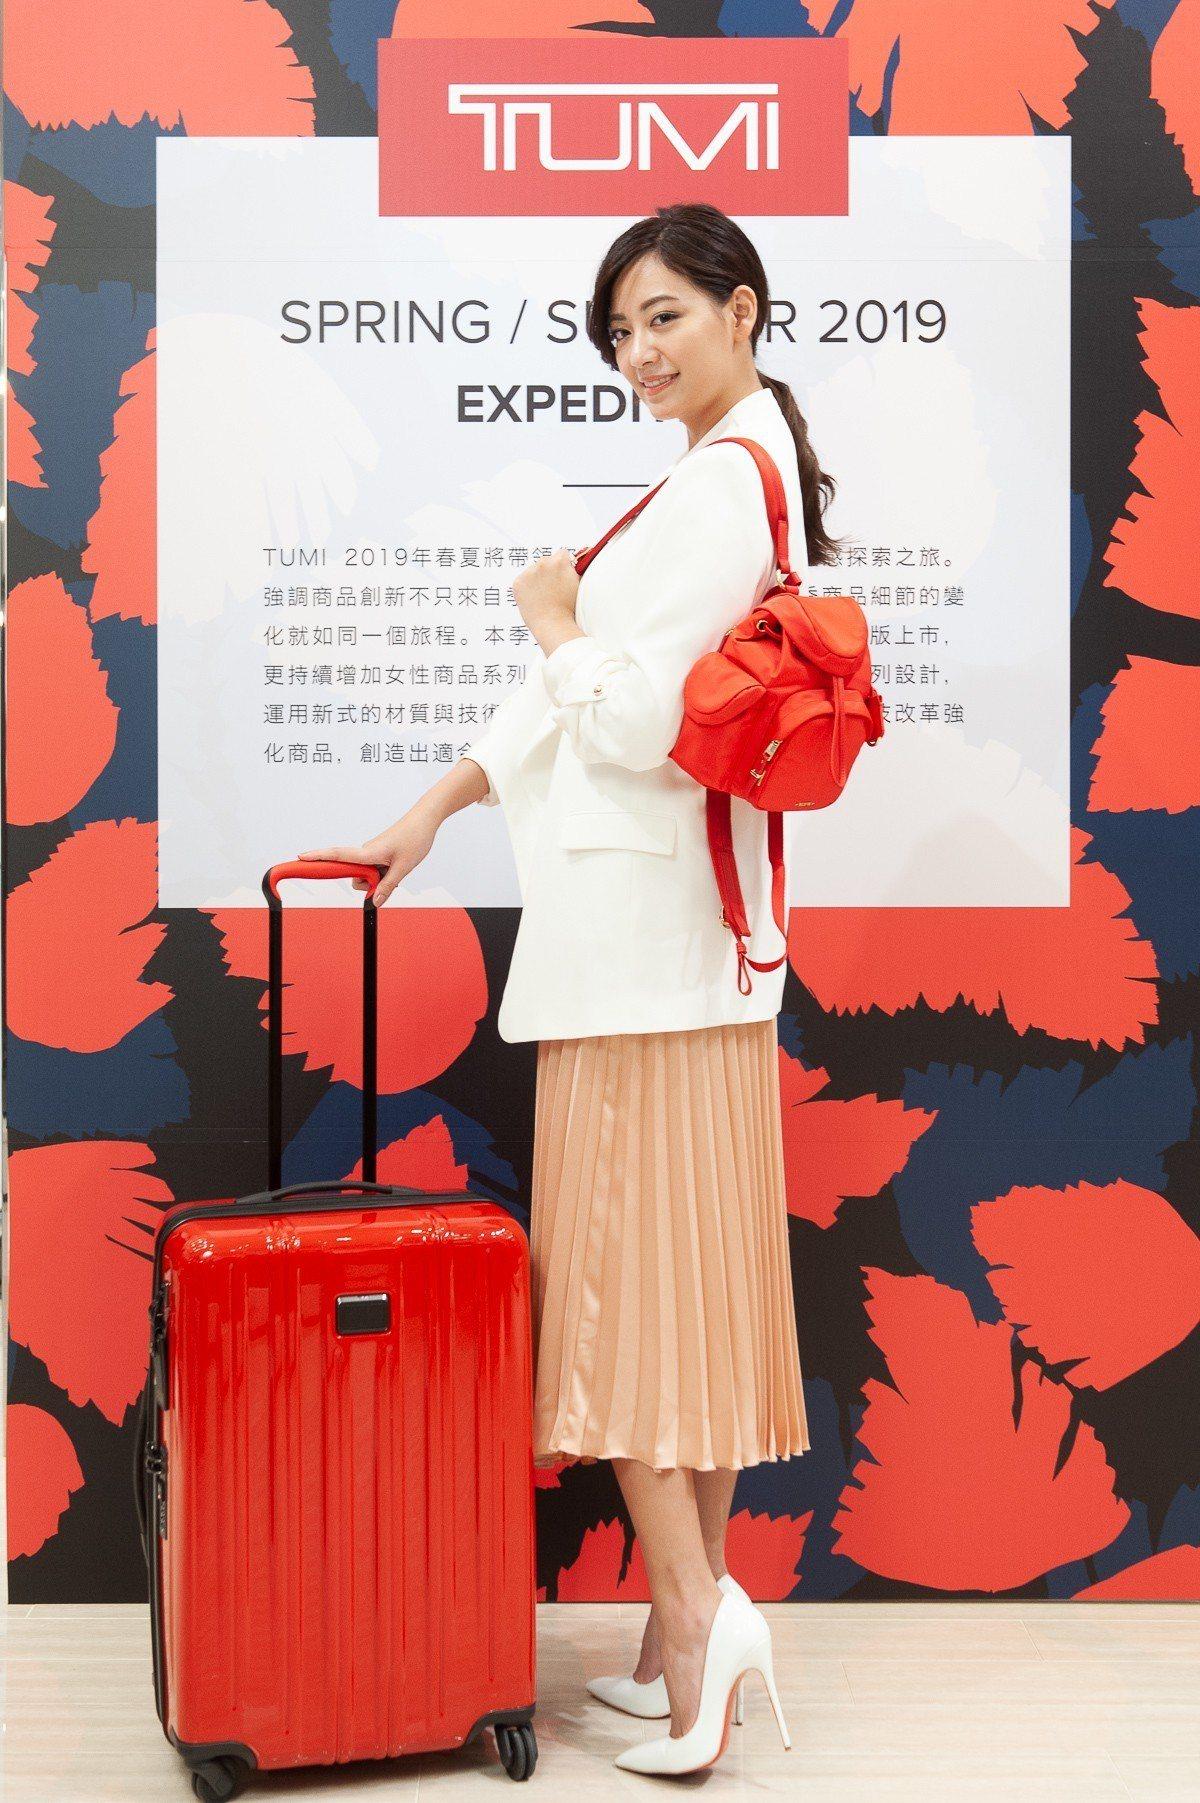 TUMI推出全新春夏系列袋包,也聽到女性消費者的心,打造了迷你款的後背包。圖/T...